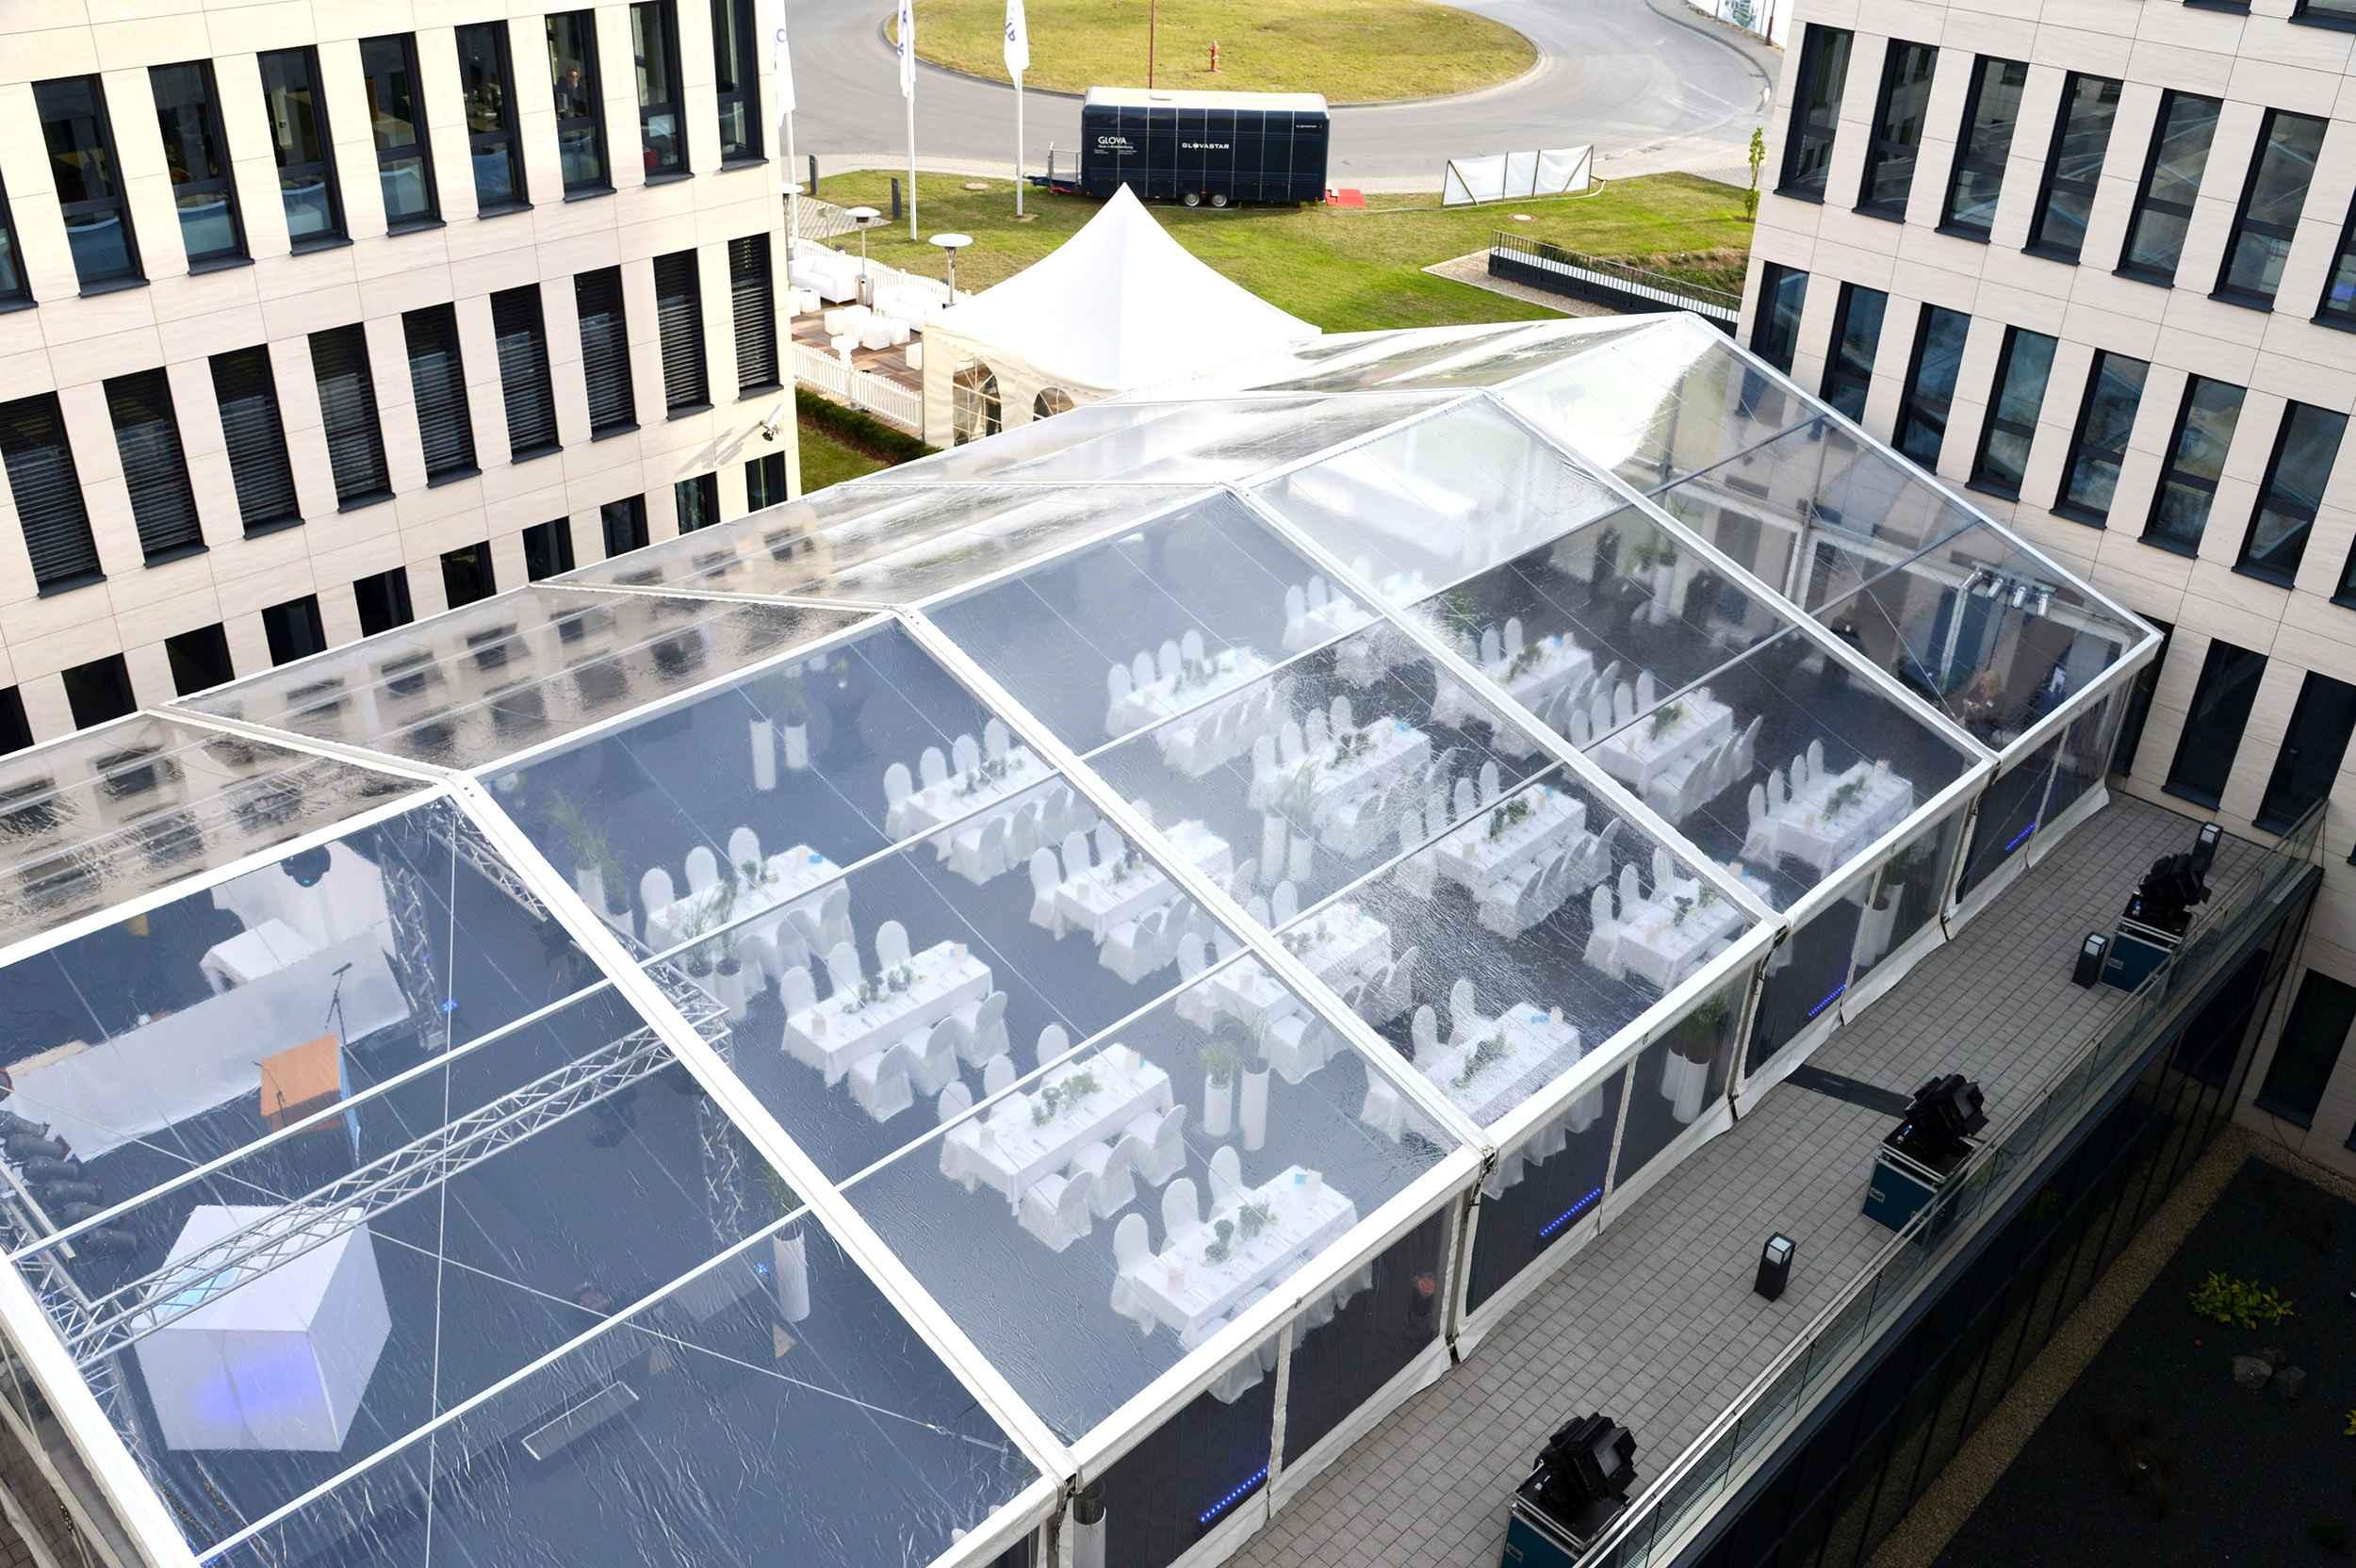 carpa transparente en Luxemburgo